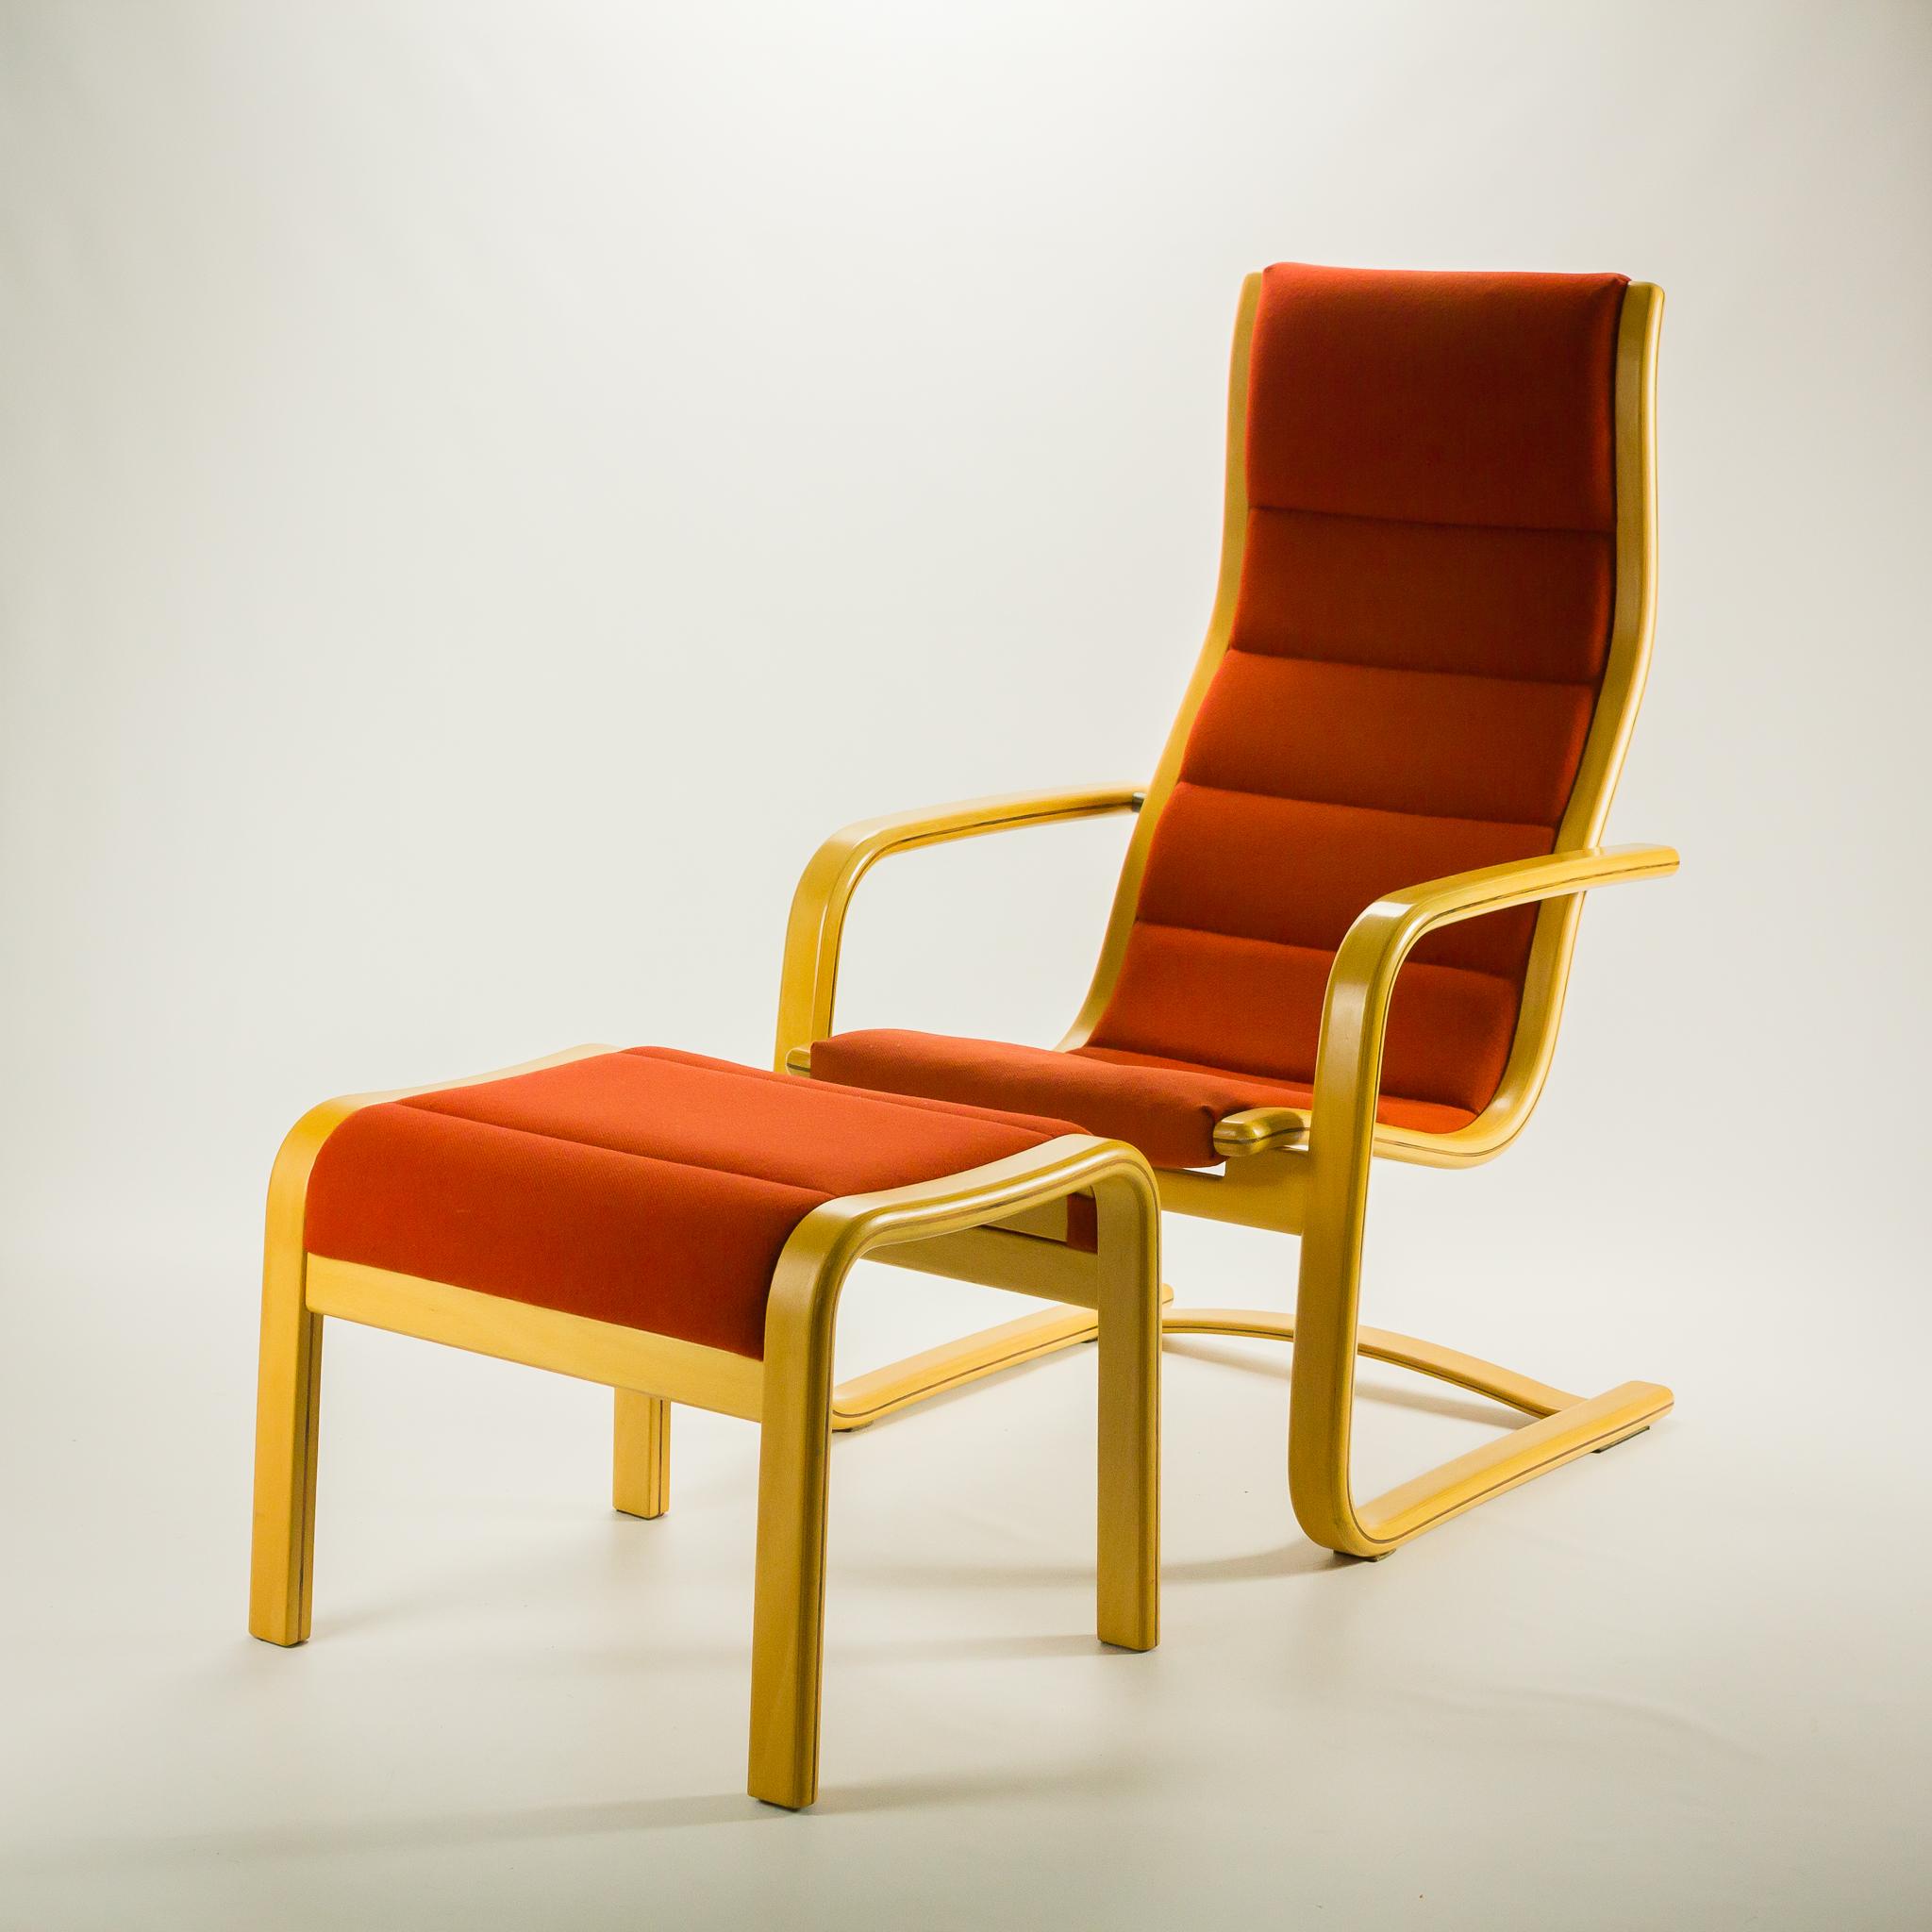 80 u2019s Swedese Lamello fauteuil hoge rug + hocker Yngve Ekstrom BarbMama